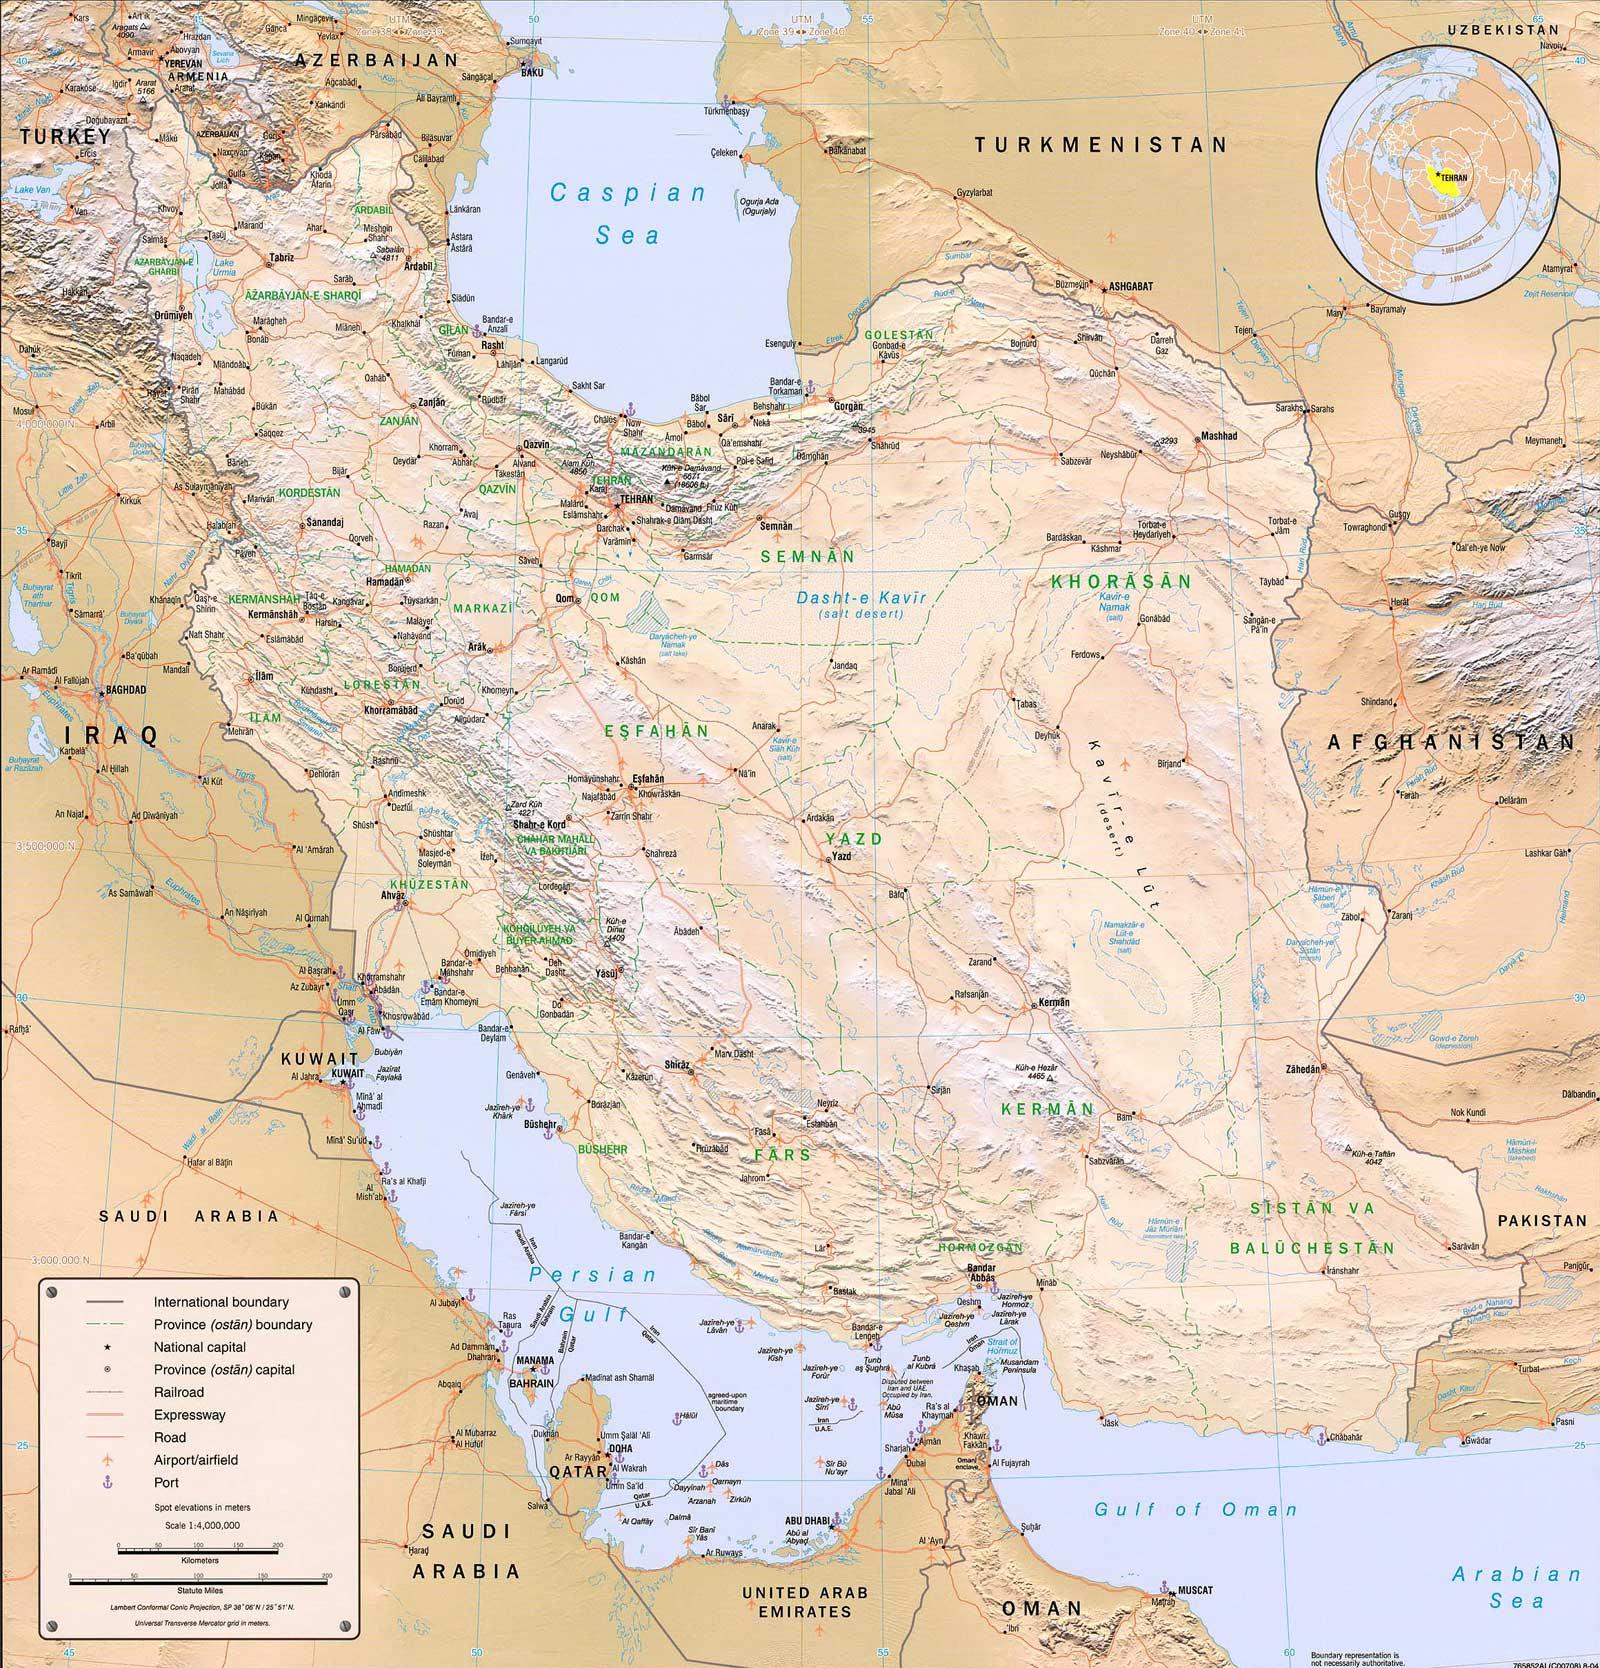 Carte détaillée de l'Iran